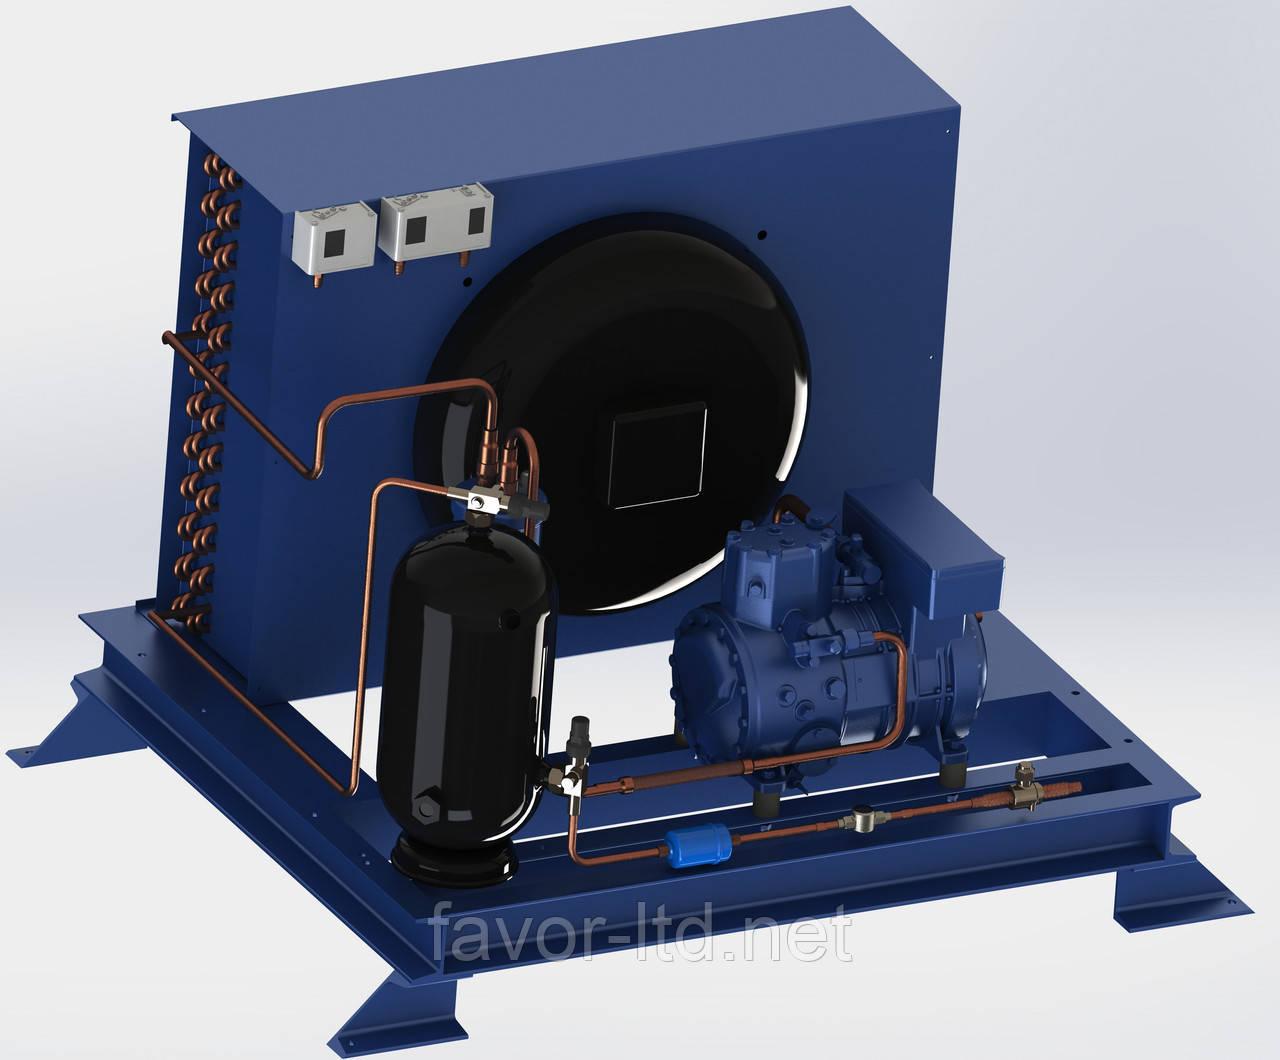 Компресорно-конденсаторний агрегат Frascold HB17/ D3-13,1 Y